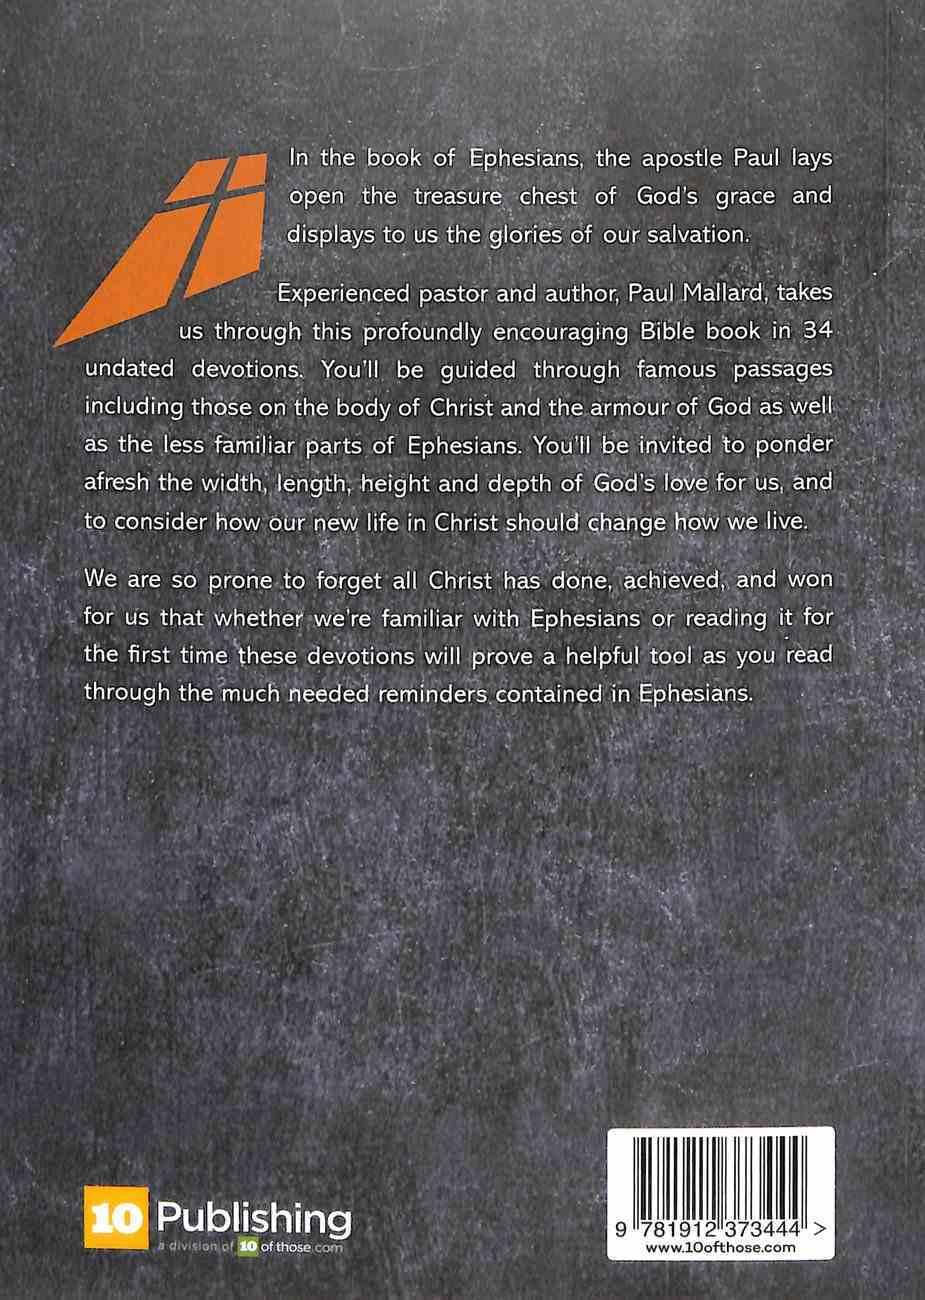 Ephesians: His Glorious Riches:34 Undated Devotions Paperback